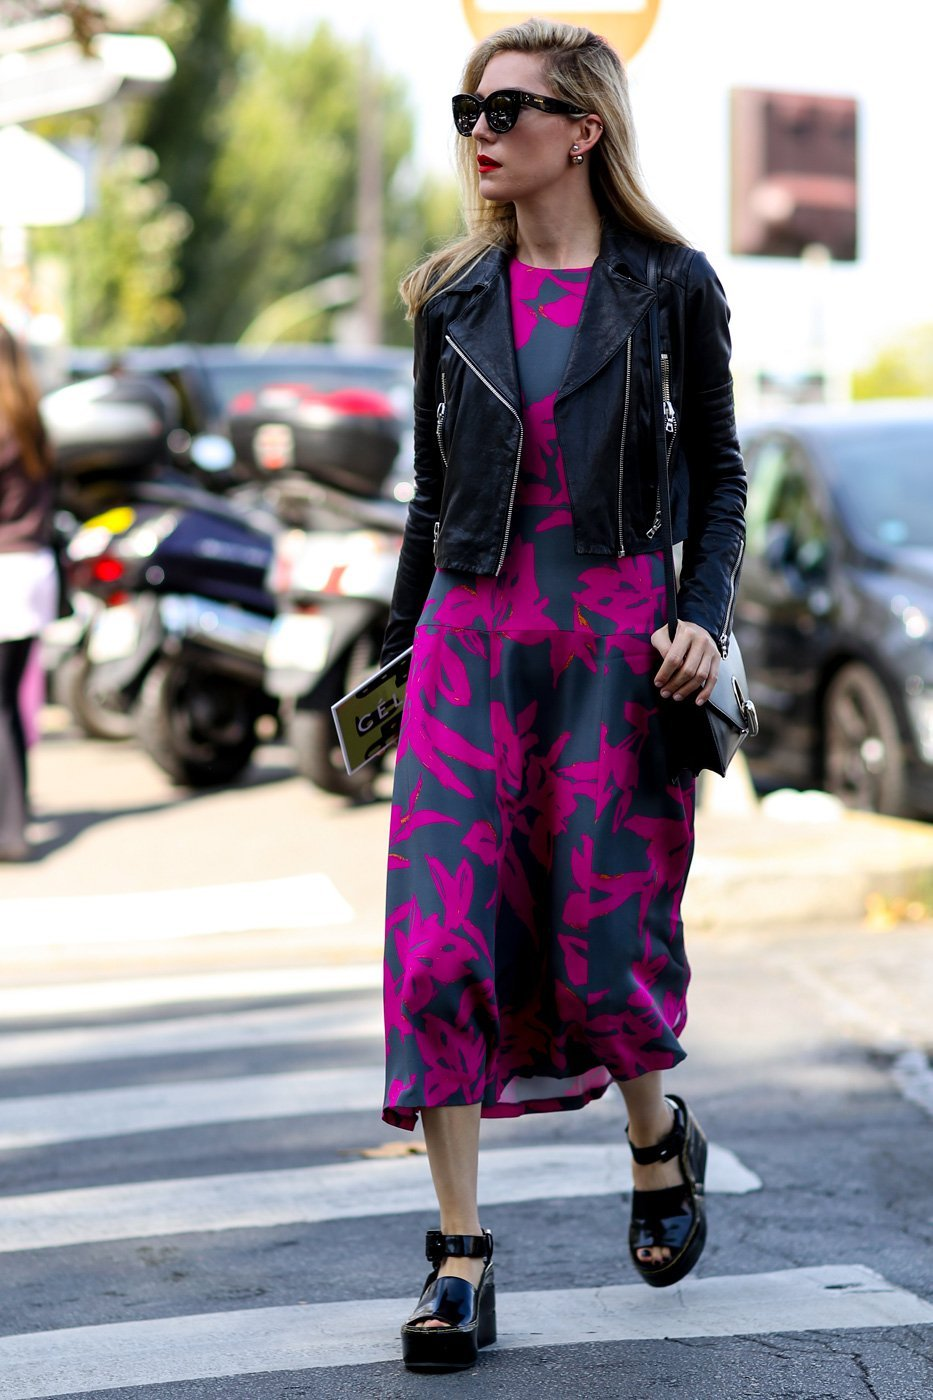 фуксия, платья с принтом, уличная мода Парижа 2015